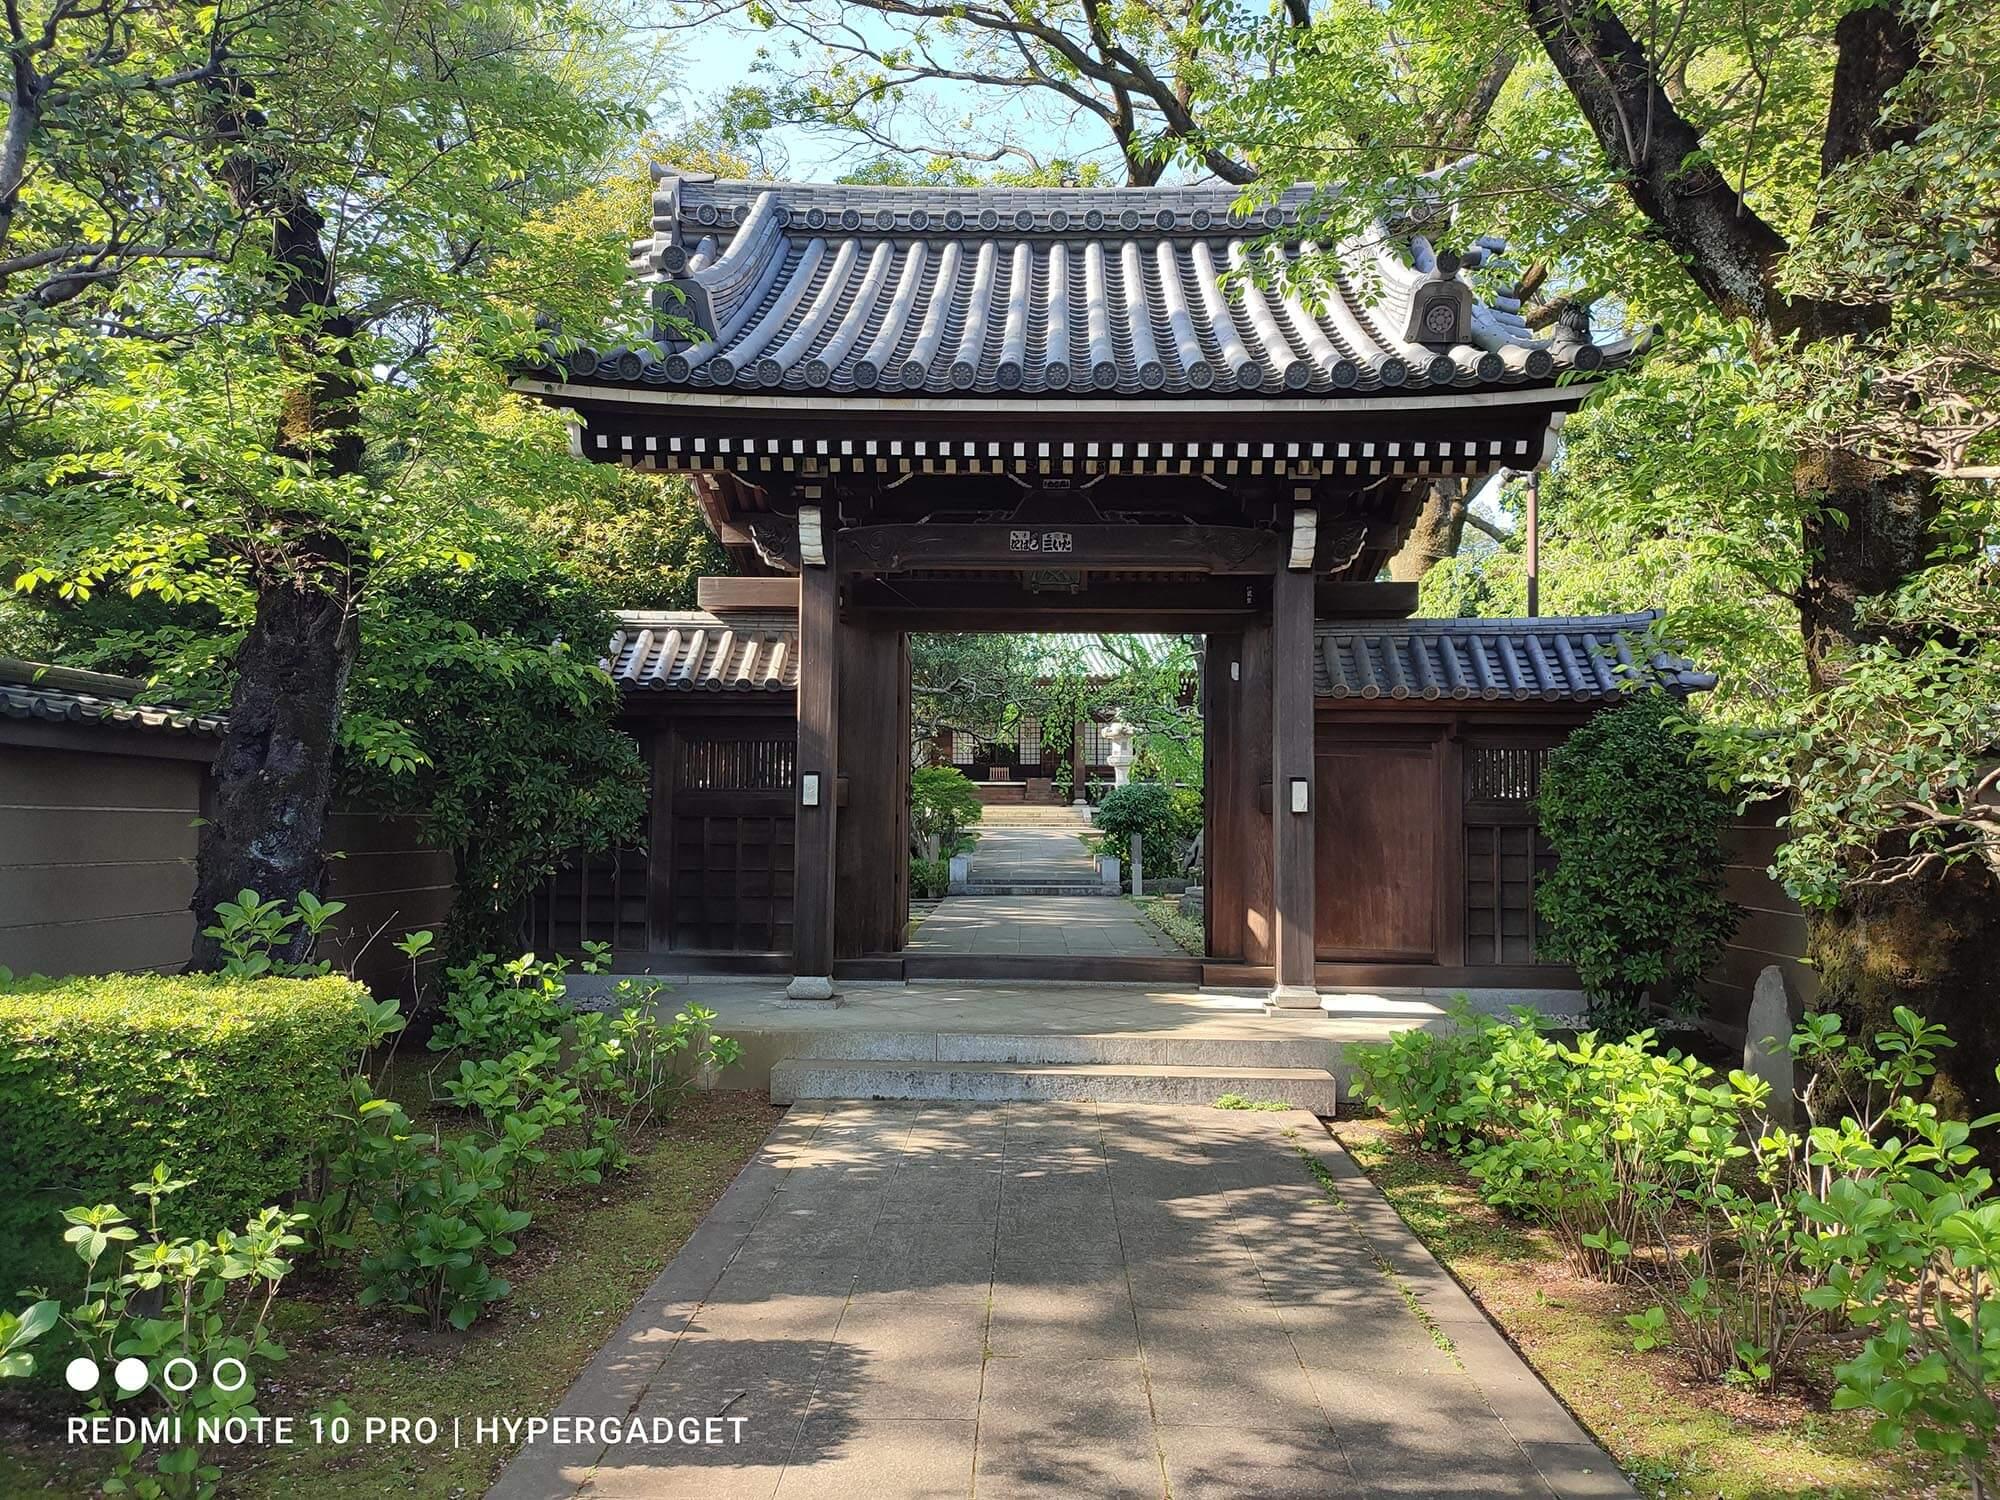 Redmi Note 10 Proで撮影したお寺の門の写真